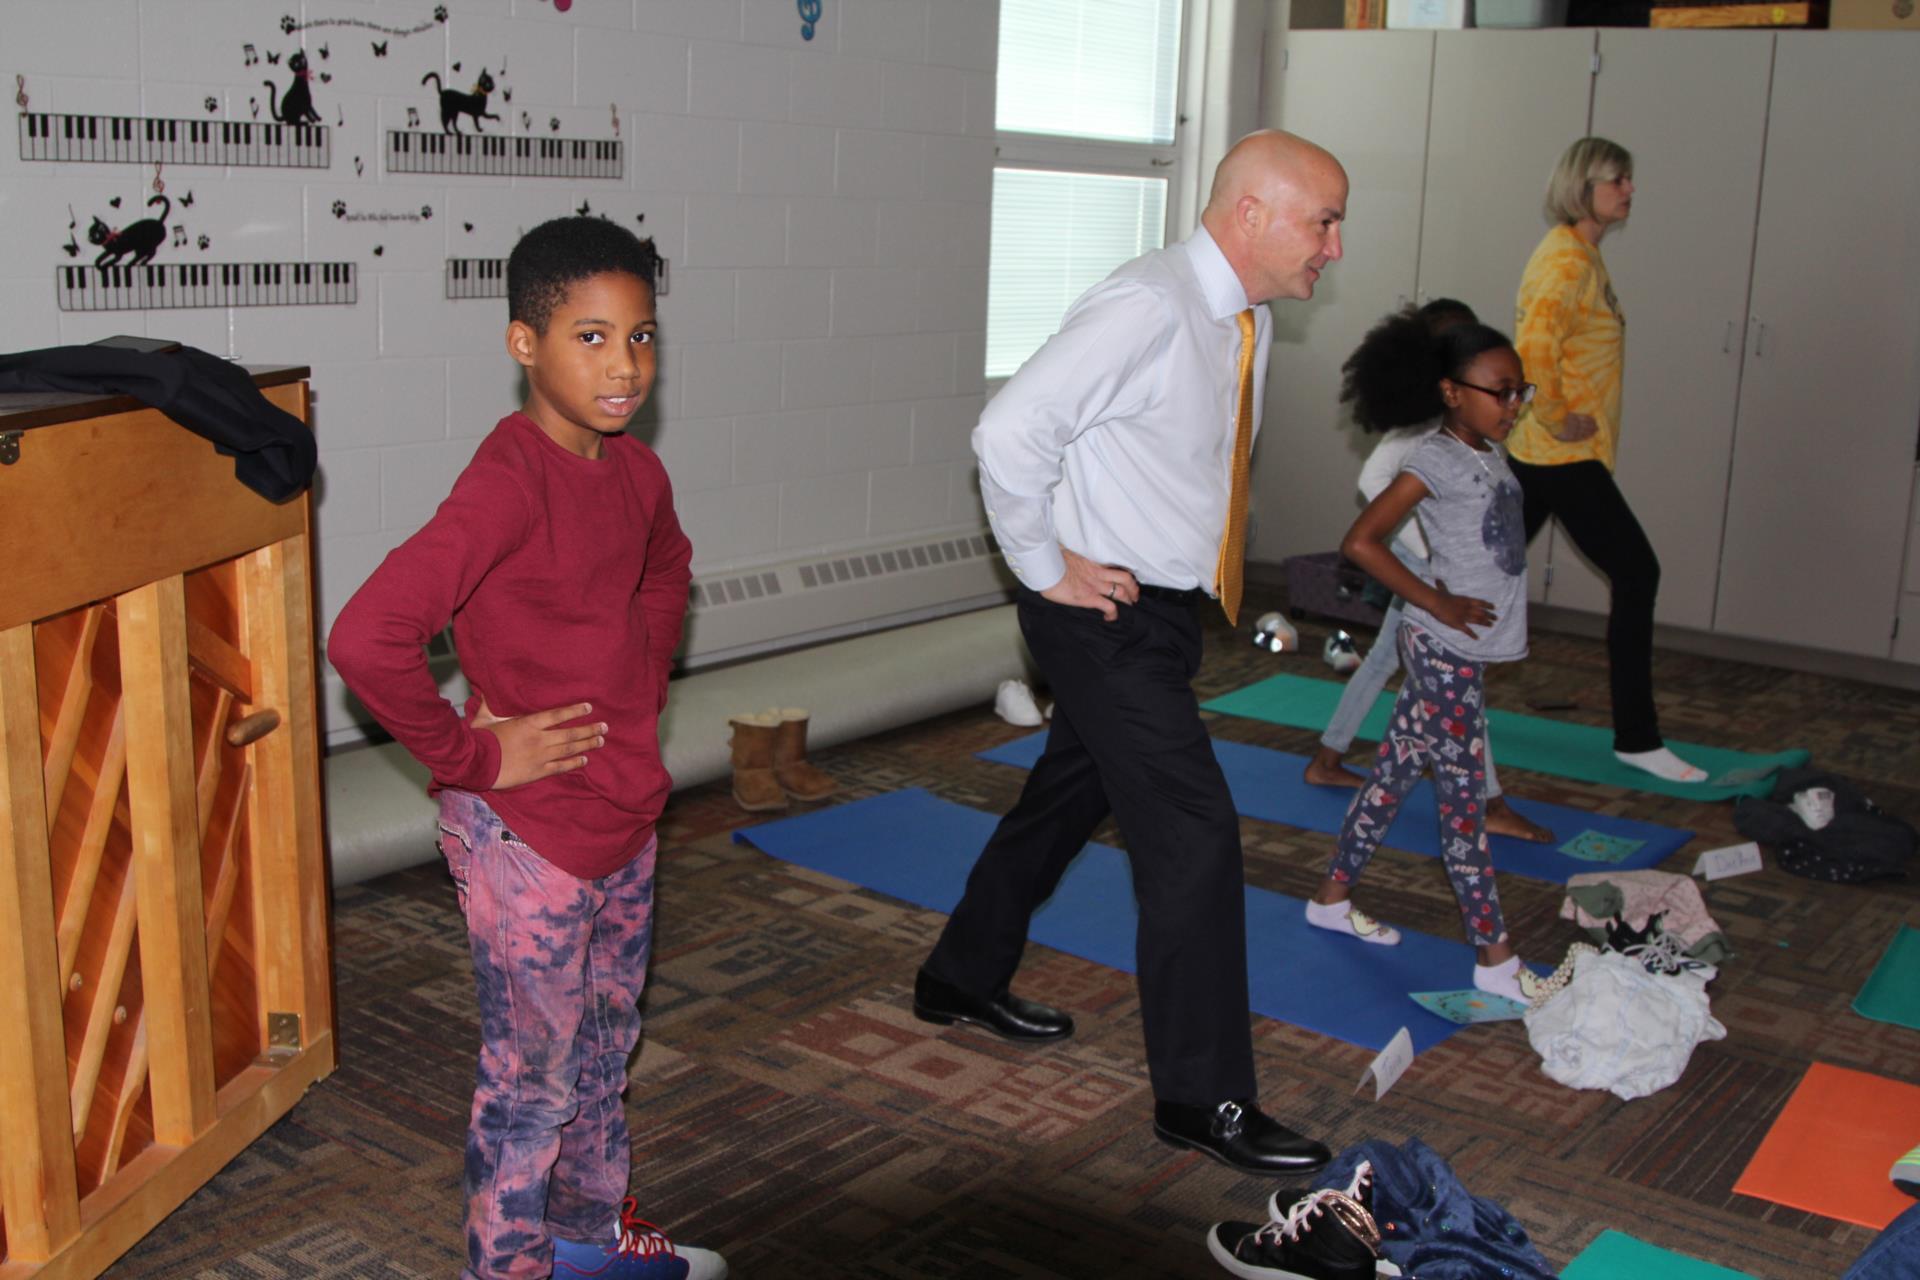 Children in yoga